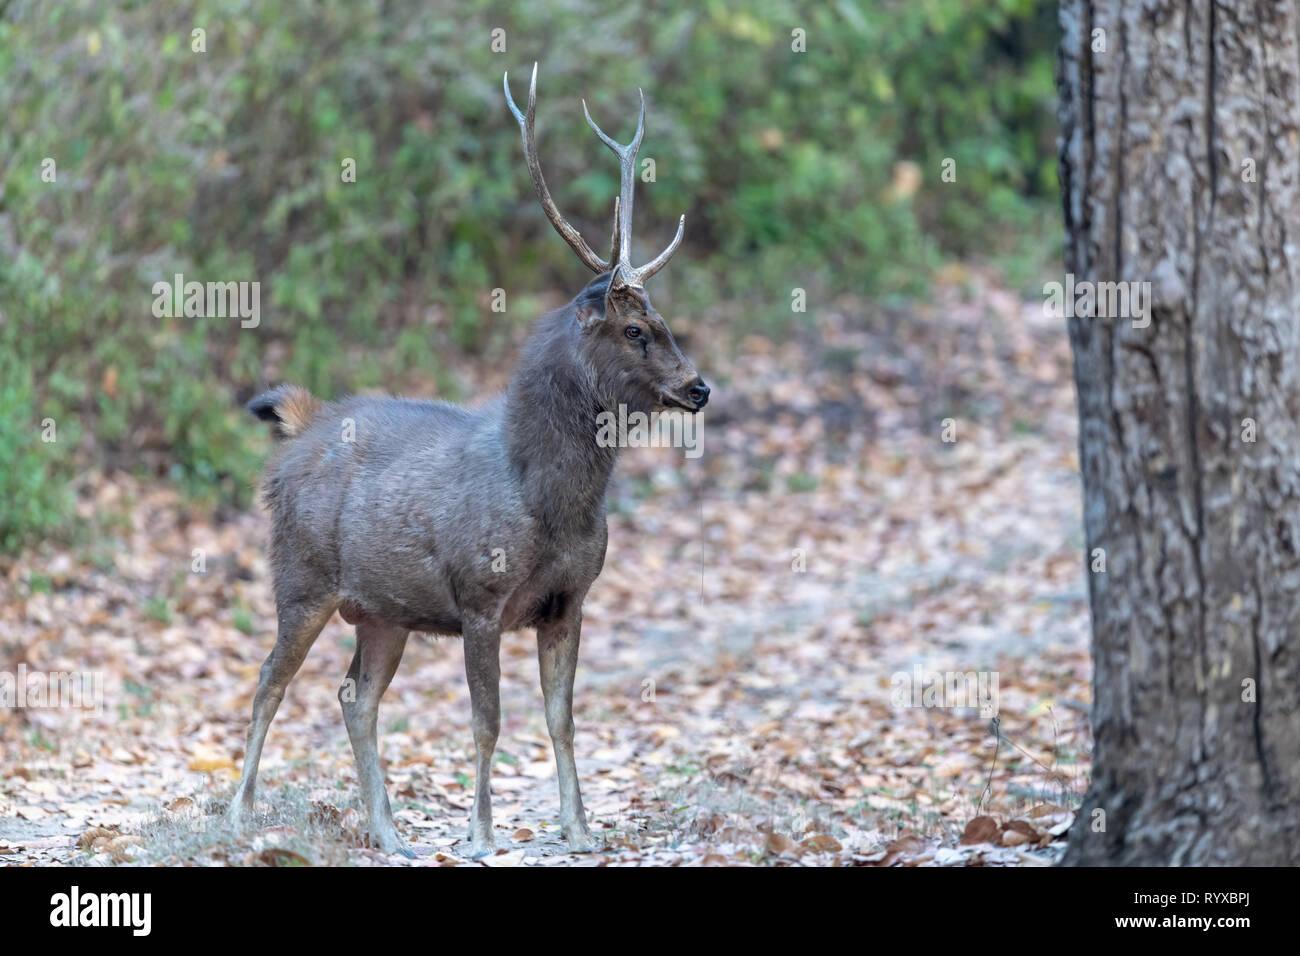 Anfällig - Gelistet Indische Sambar Hirsch (Rusa unicolor unicolor) in Indien Stockbild